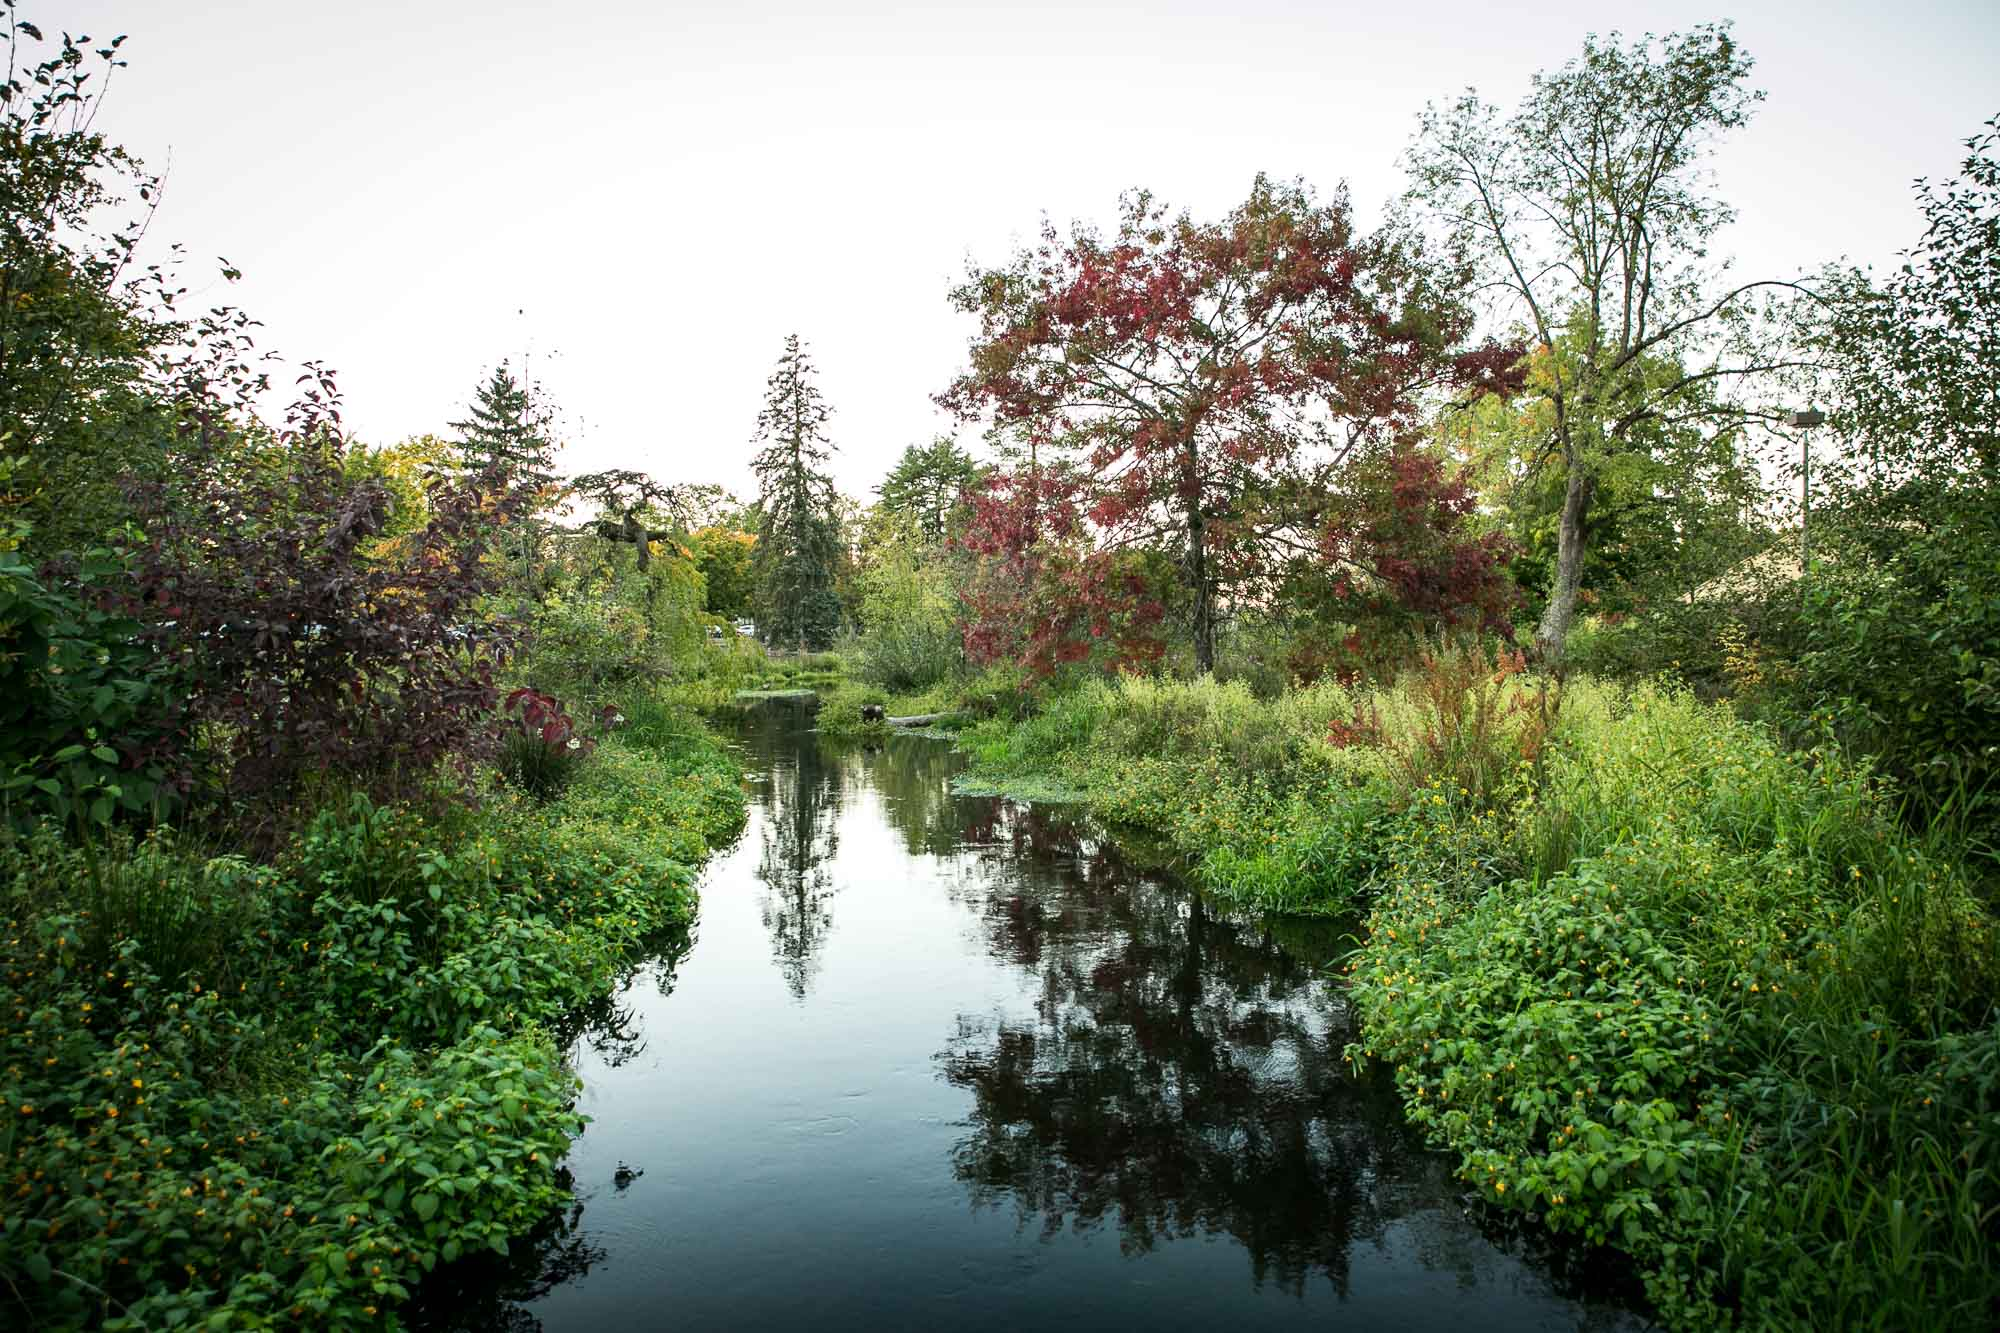 visit-sellwood-moreland-business-alliance_westmoreland-park-5.jpg